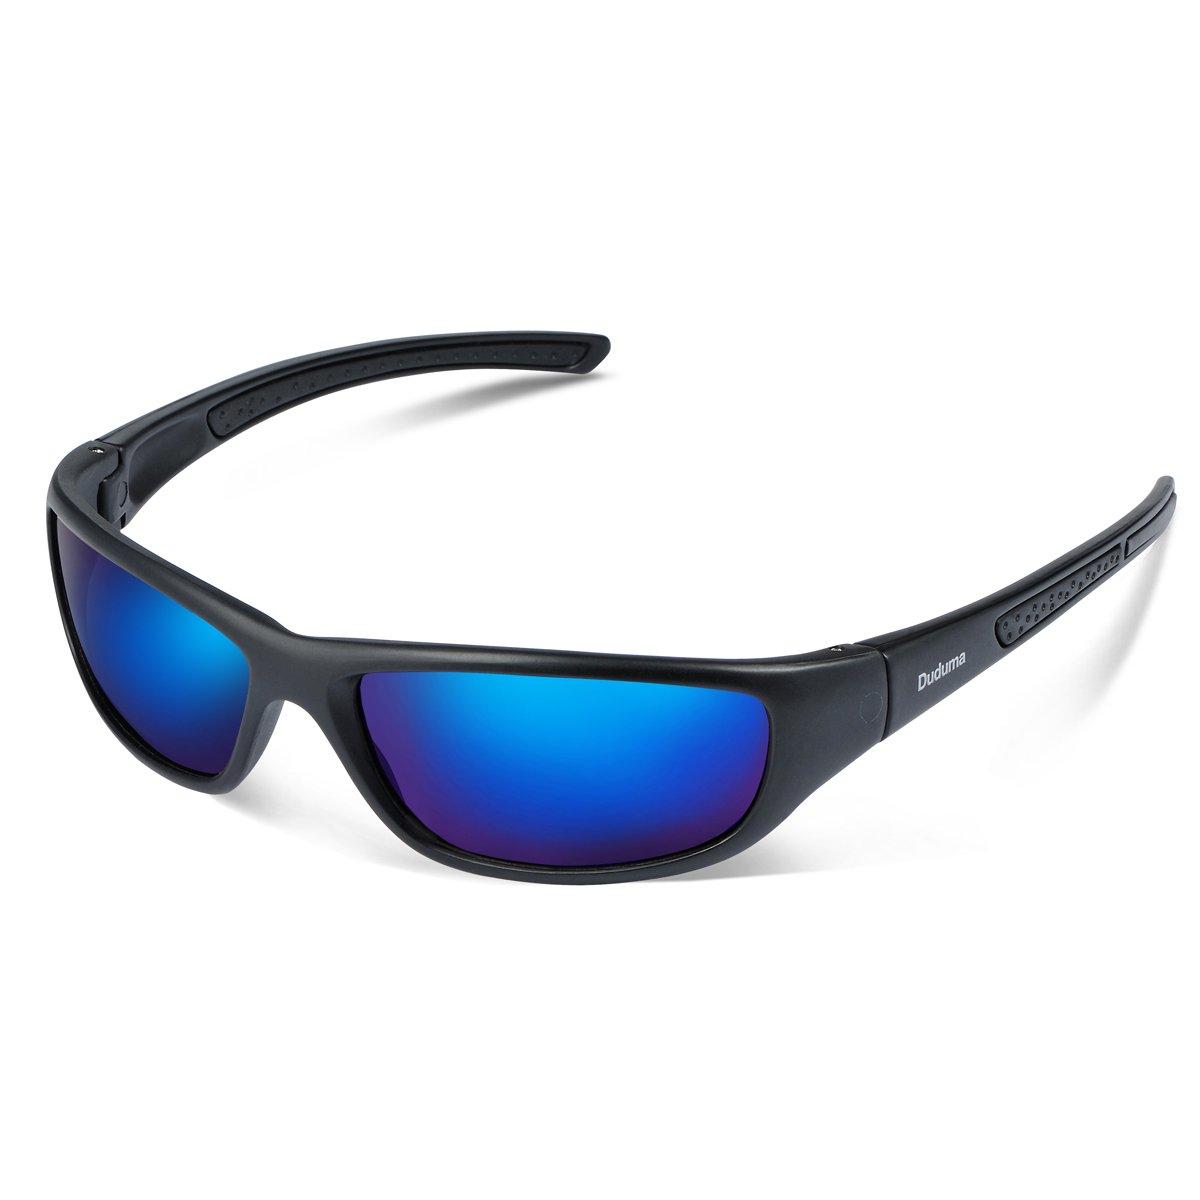 Duduma Polarized Sports Sunglasses for Men Women Baseball Running Cycling Fishing Driving Golf Softball Hiking Sun Glasses Tr8116 by Duduma